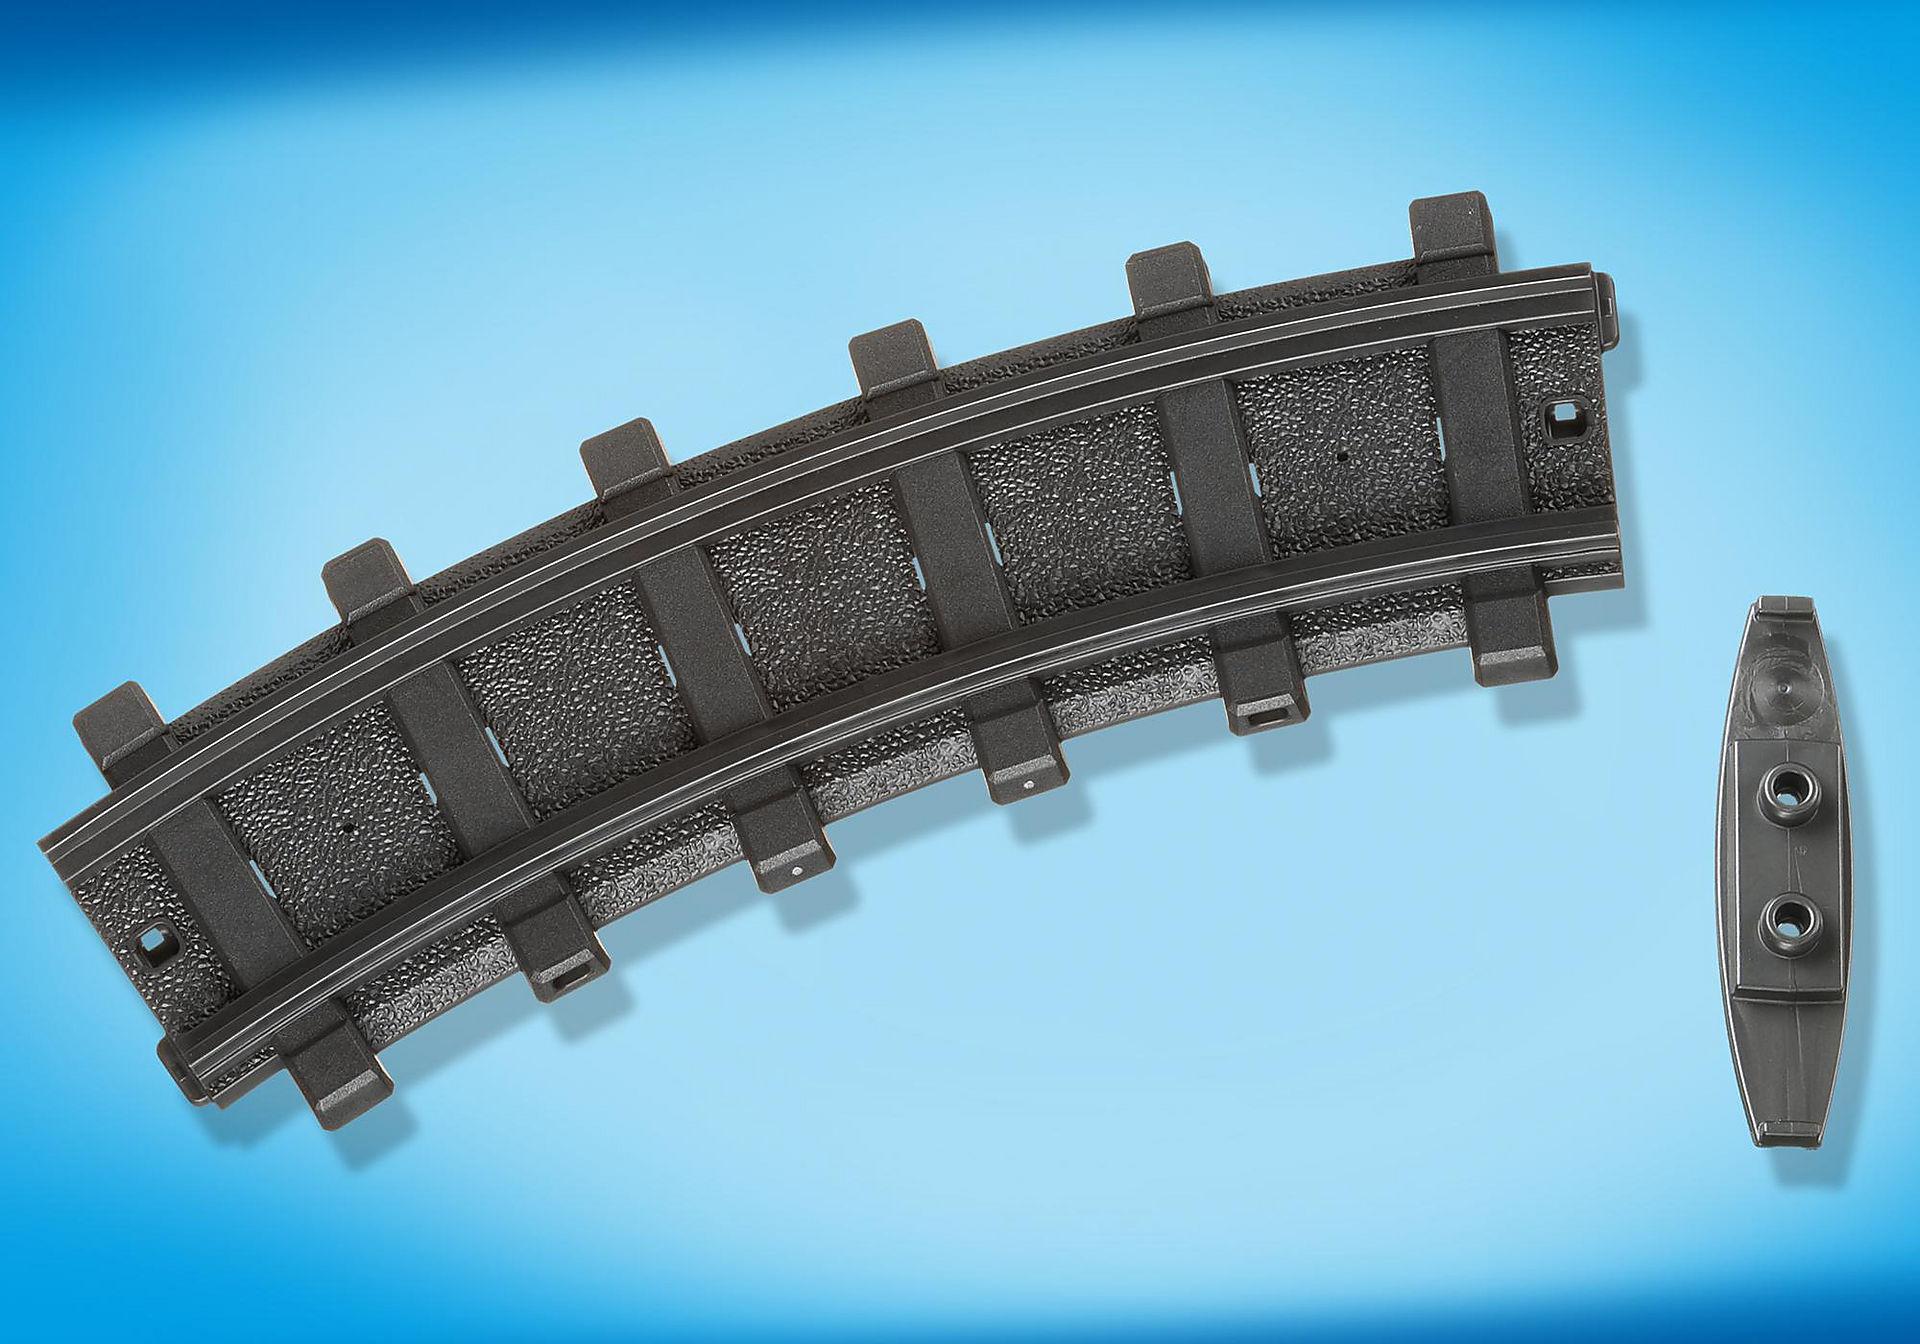 http://media.playmobil.com/i/playmobil/4385_product_detail/12 καμπύλες σιδηροτροχιές